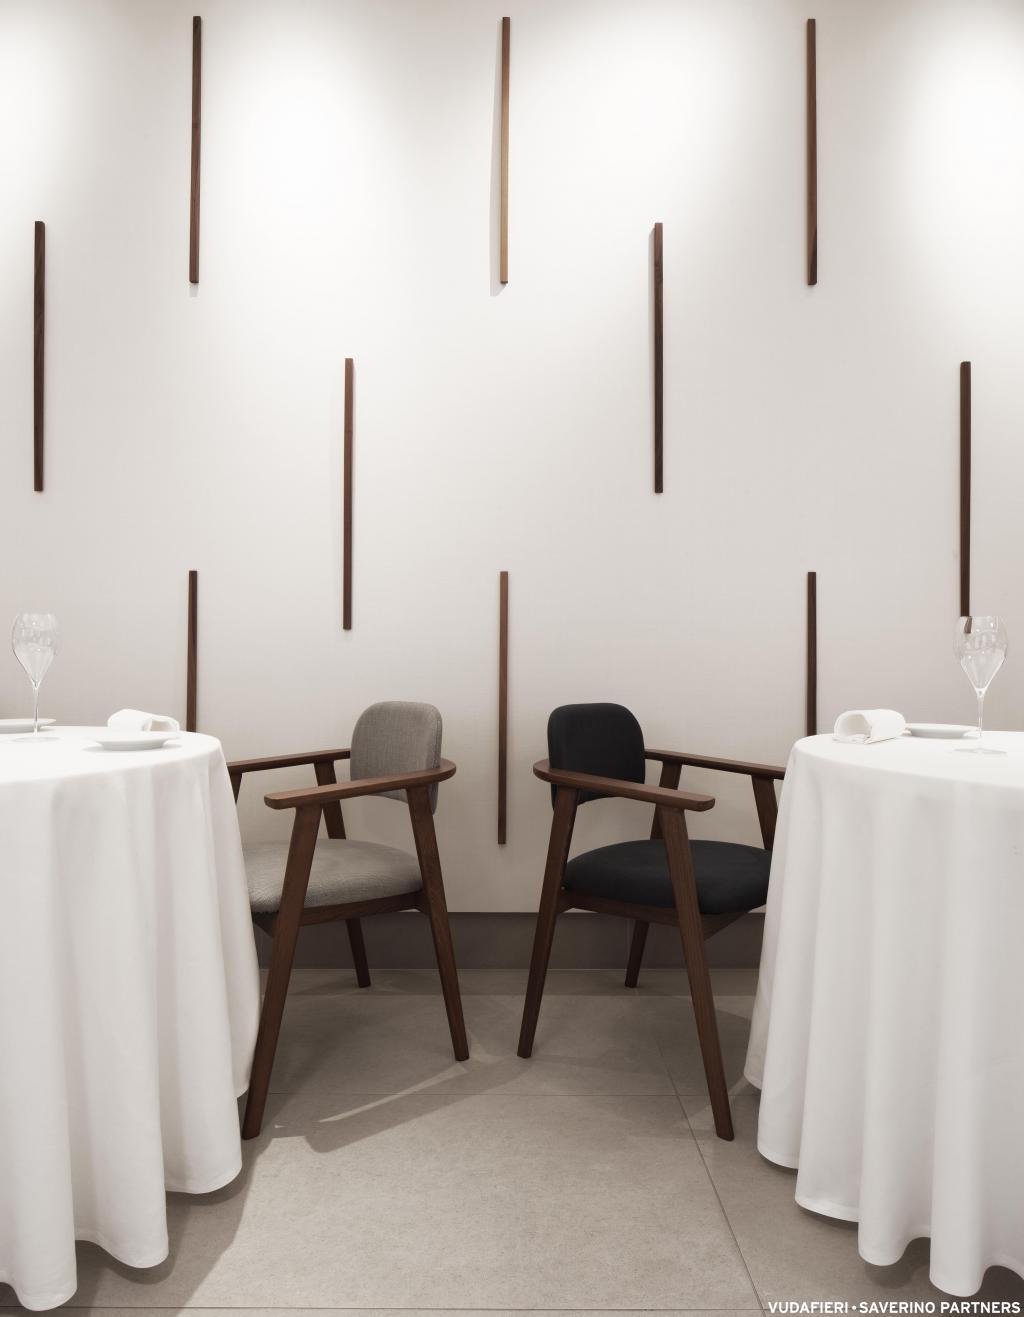 vudafieri-saverino See Vudafieri-Saverino's restyling of historical restaurant in Milan 05aimoenadiabysanticalecatagliatacopy